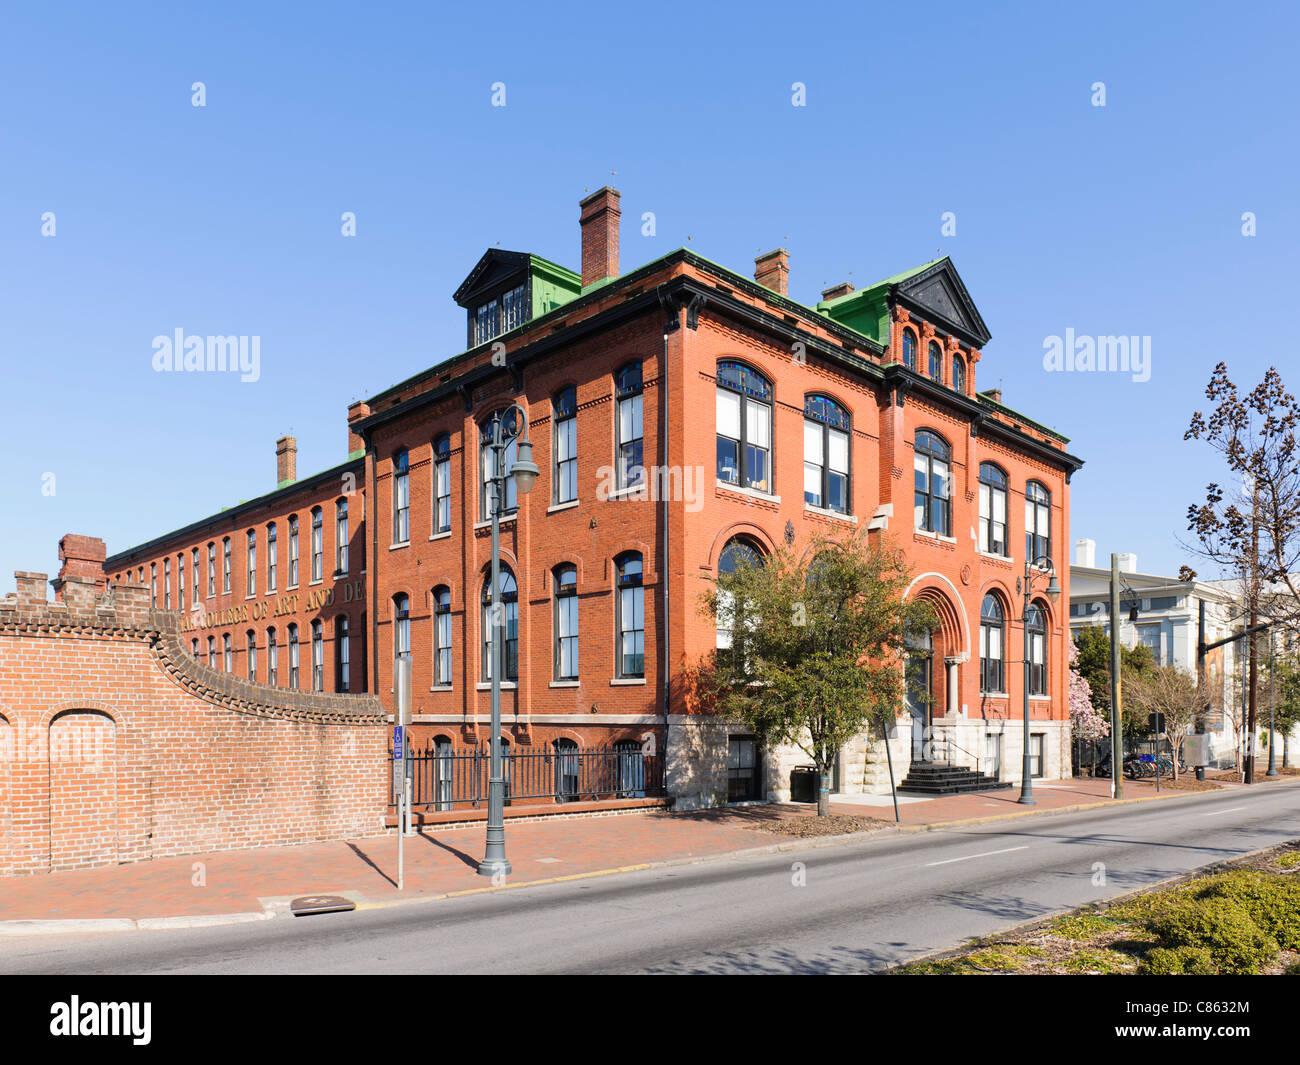 SCAD Savannah - Stock Image